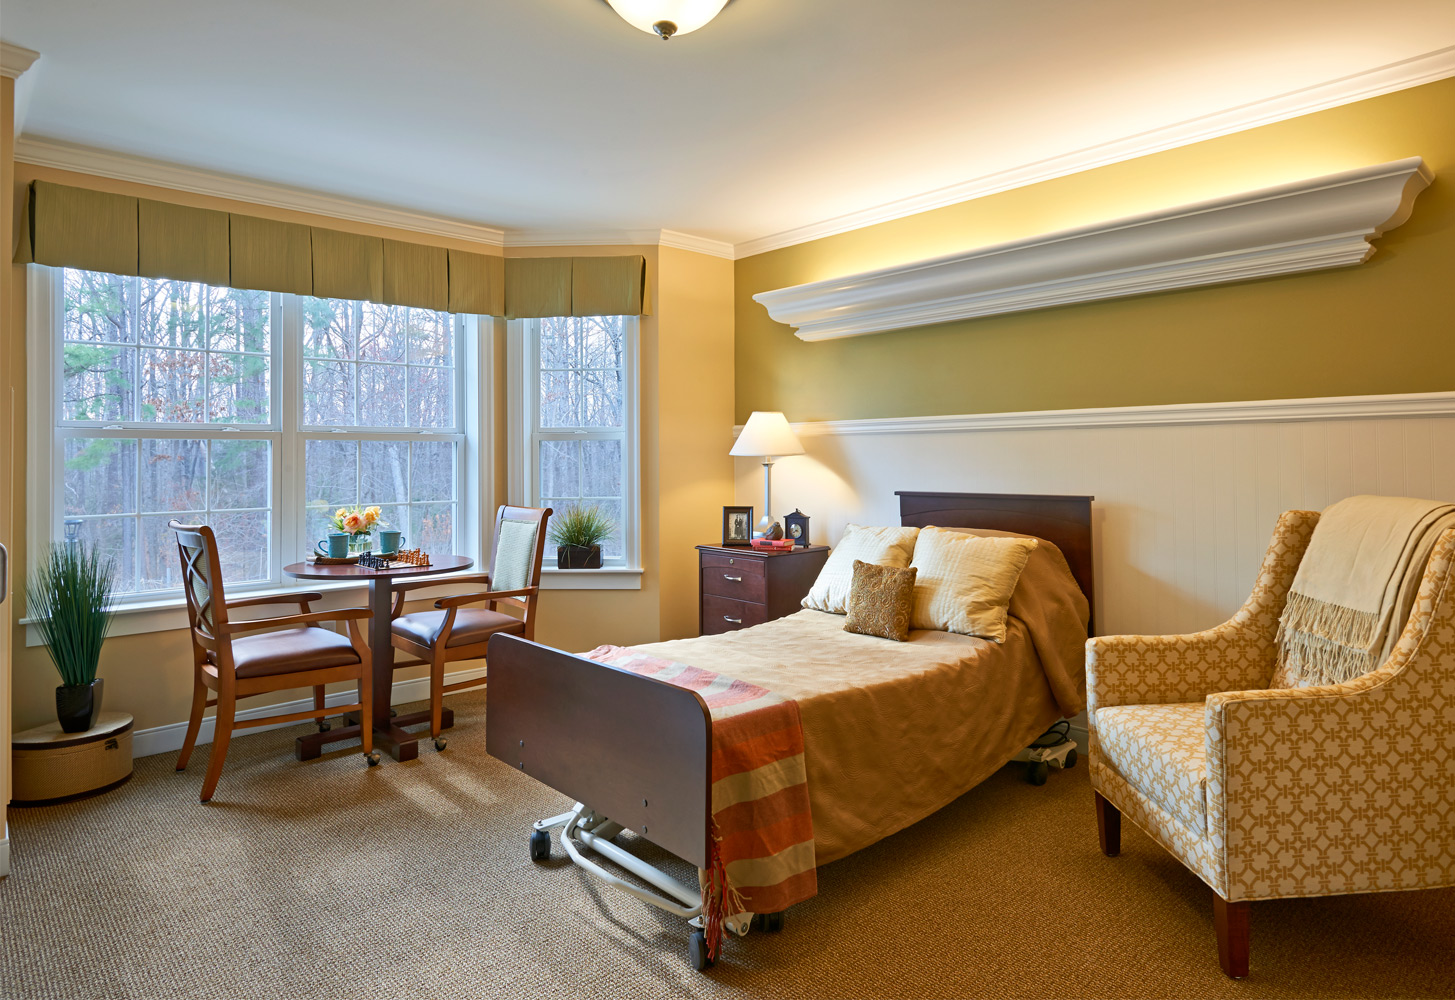 Brandermill Woods Skilled Care Bedroom Image